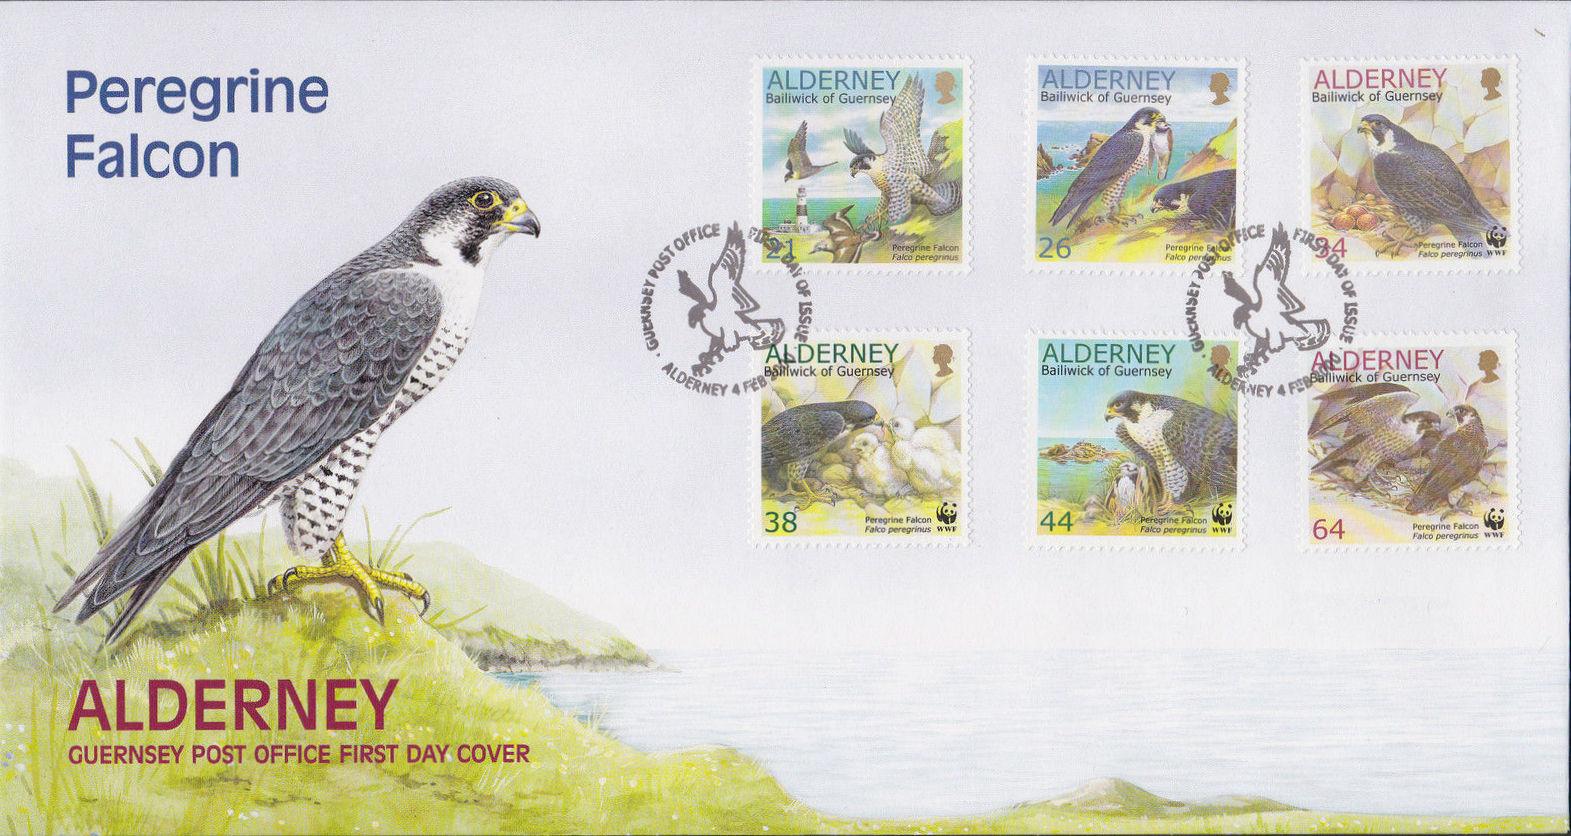 Alderney 2000 WWF Peregrine Falcon FDCa.jpg